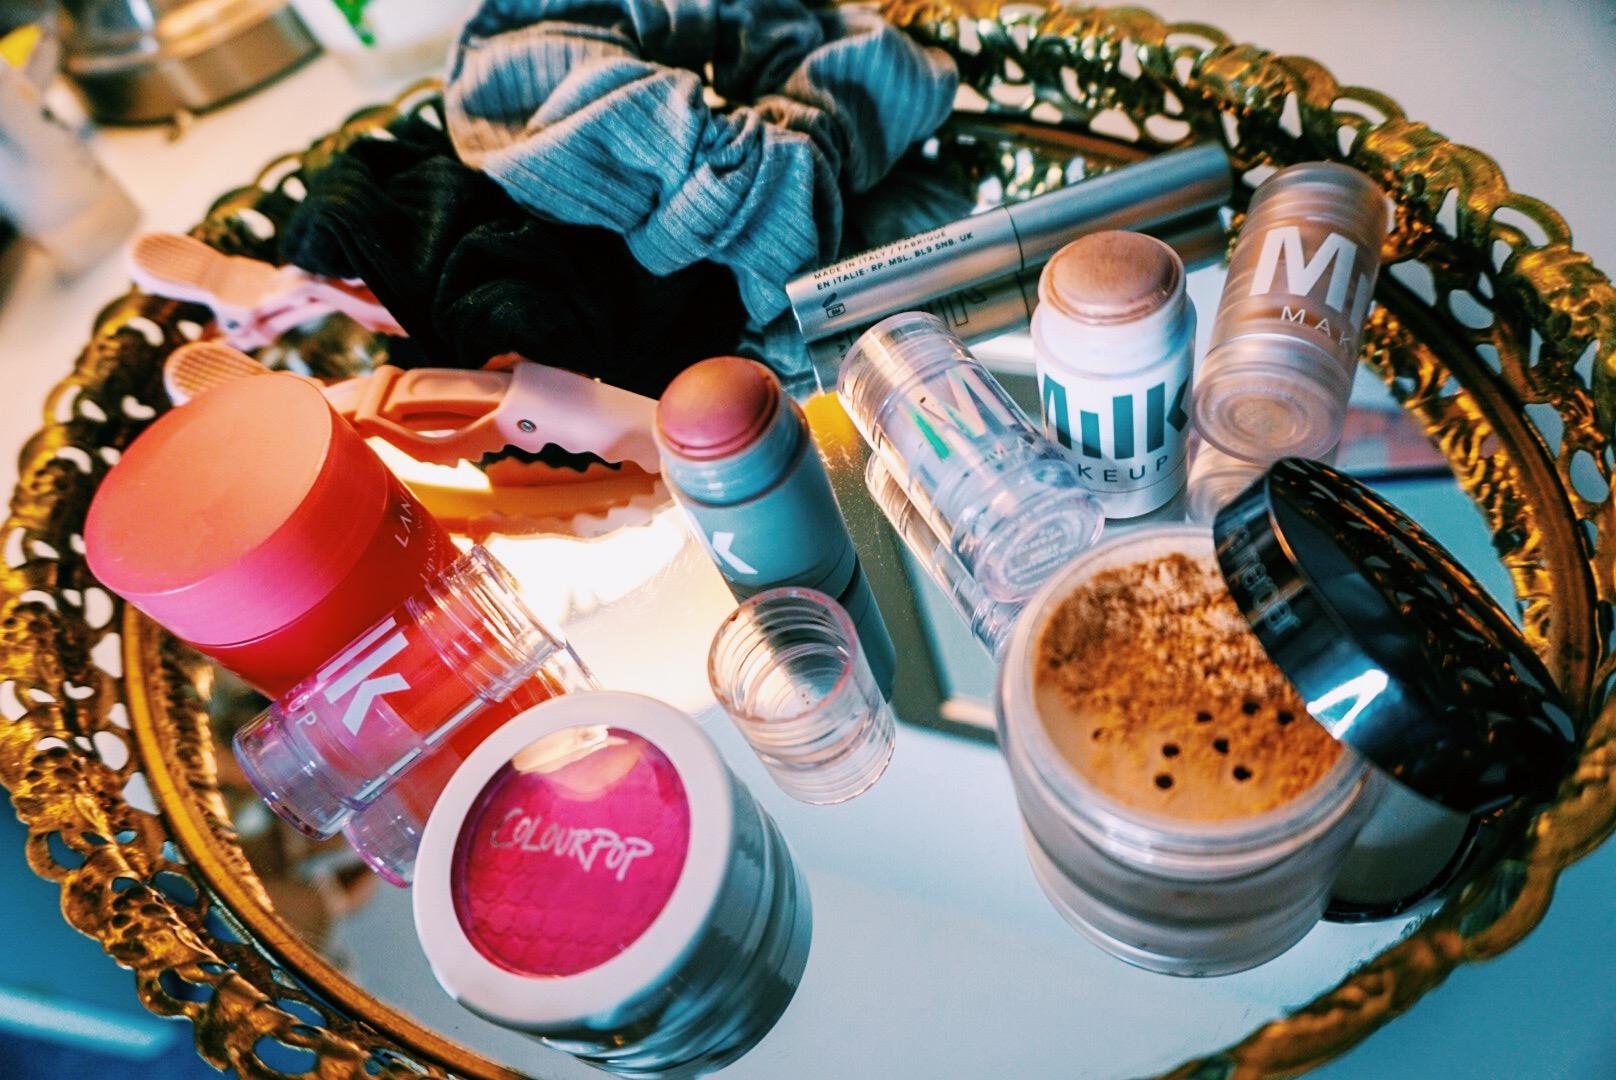 Milk Makeup Review | Beauty Flat Lay | Blush, Highlighter, Primer, Toner, Mascara